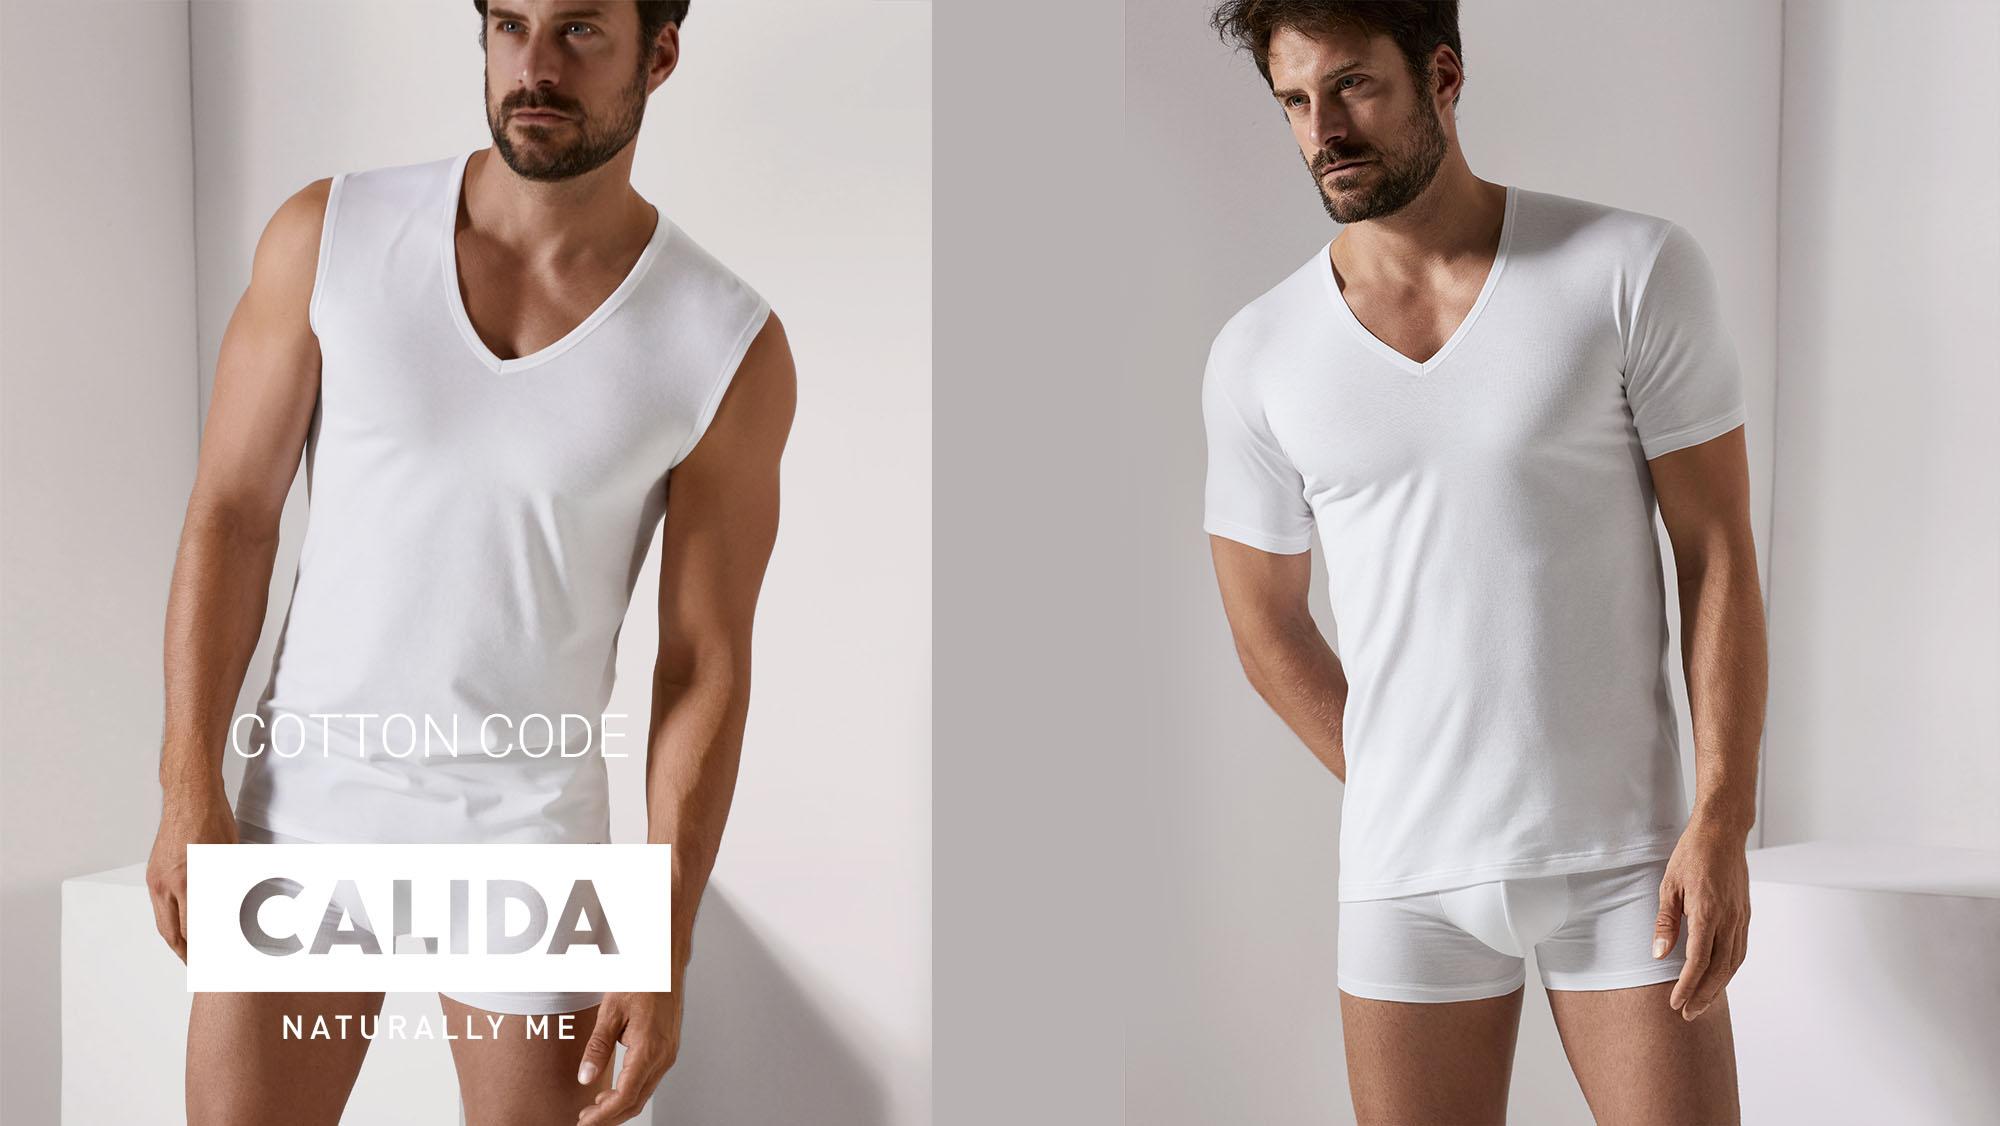 Calida Cotton Code